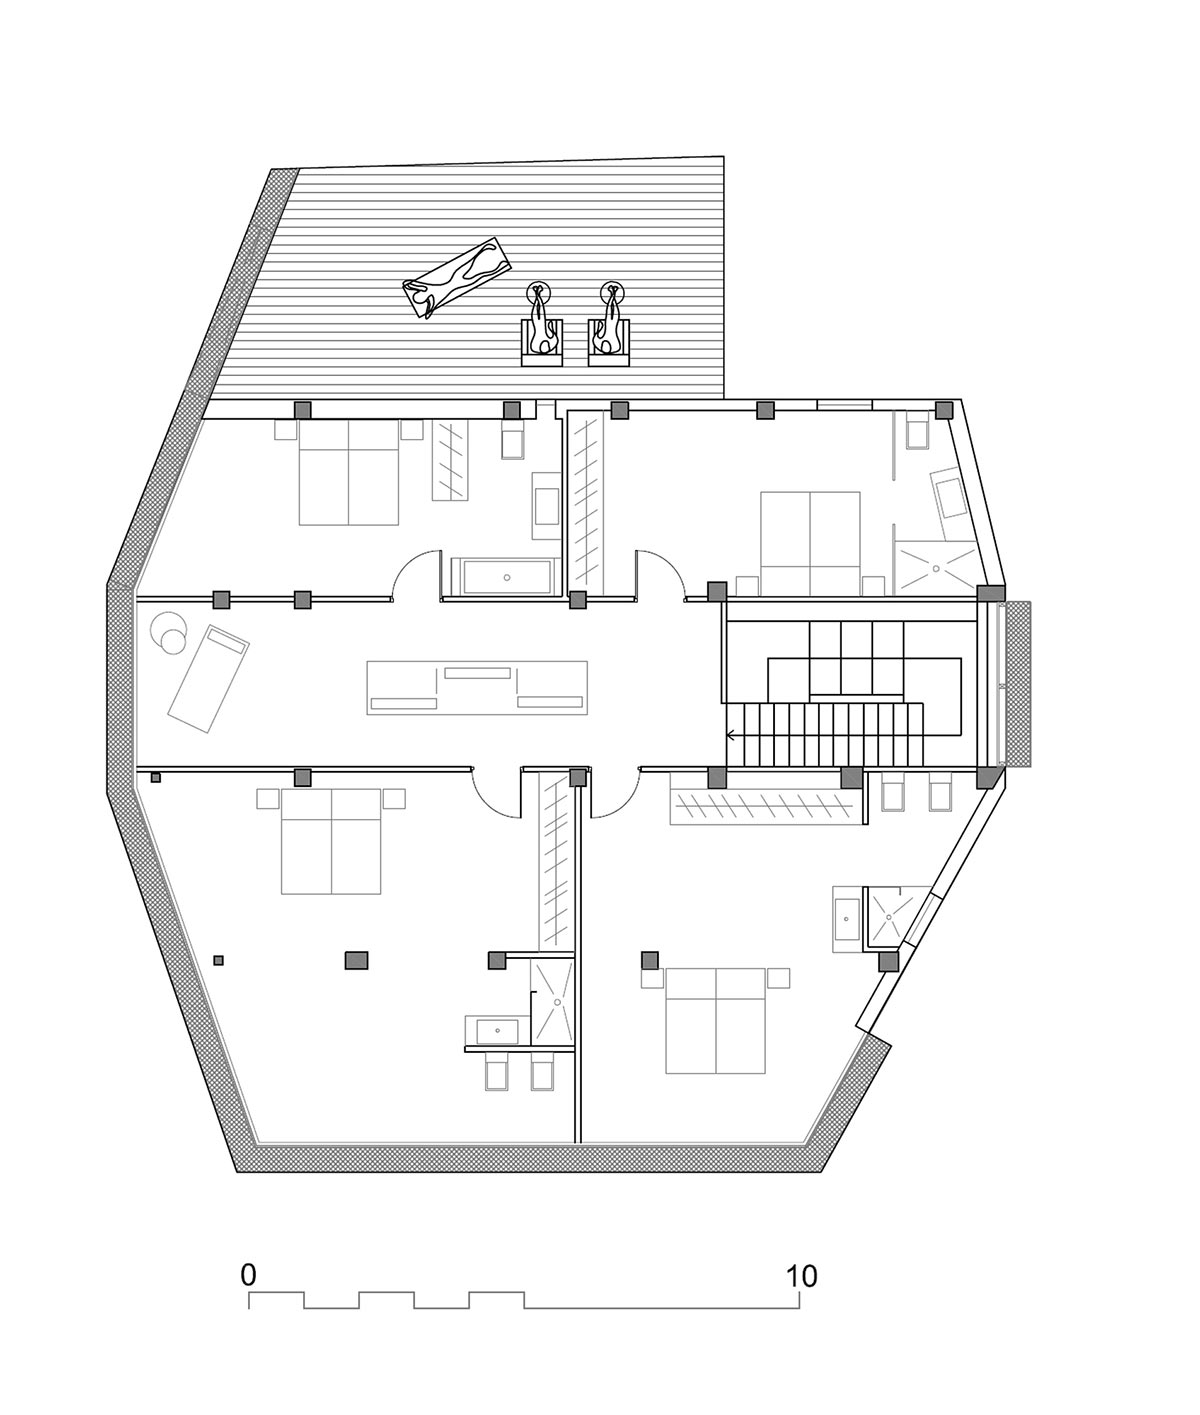 Plan, Diamond House, Alicante, Spain by Abis Arquitectura